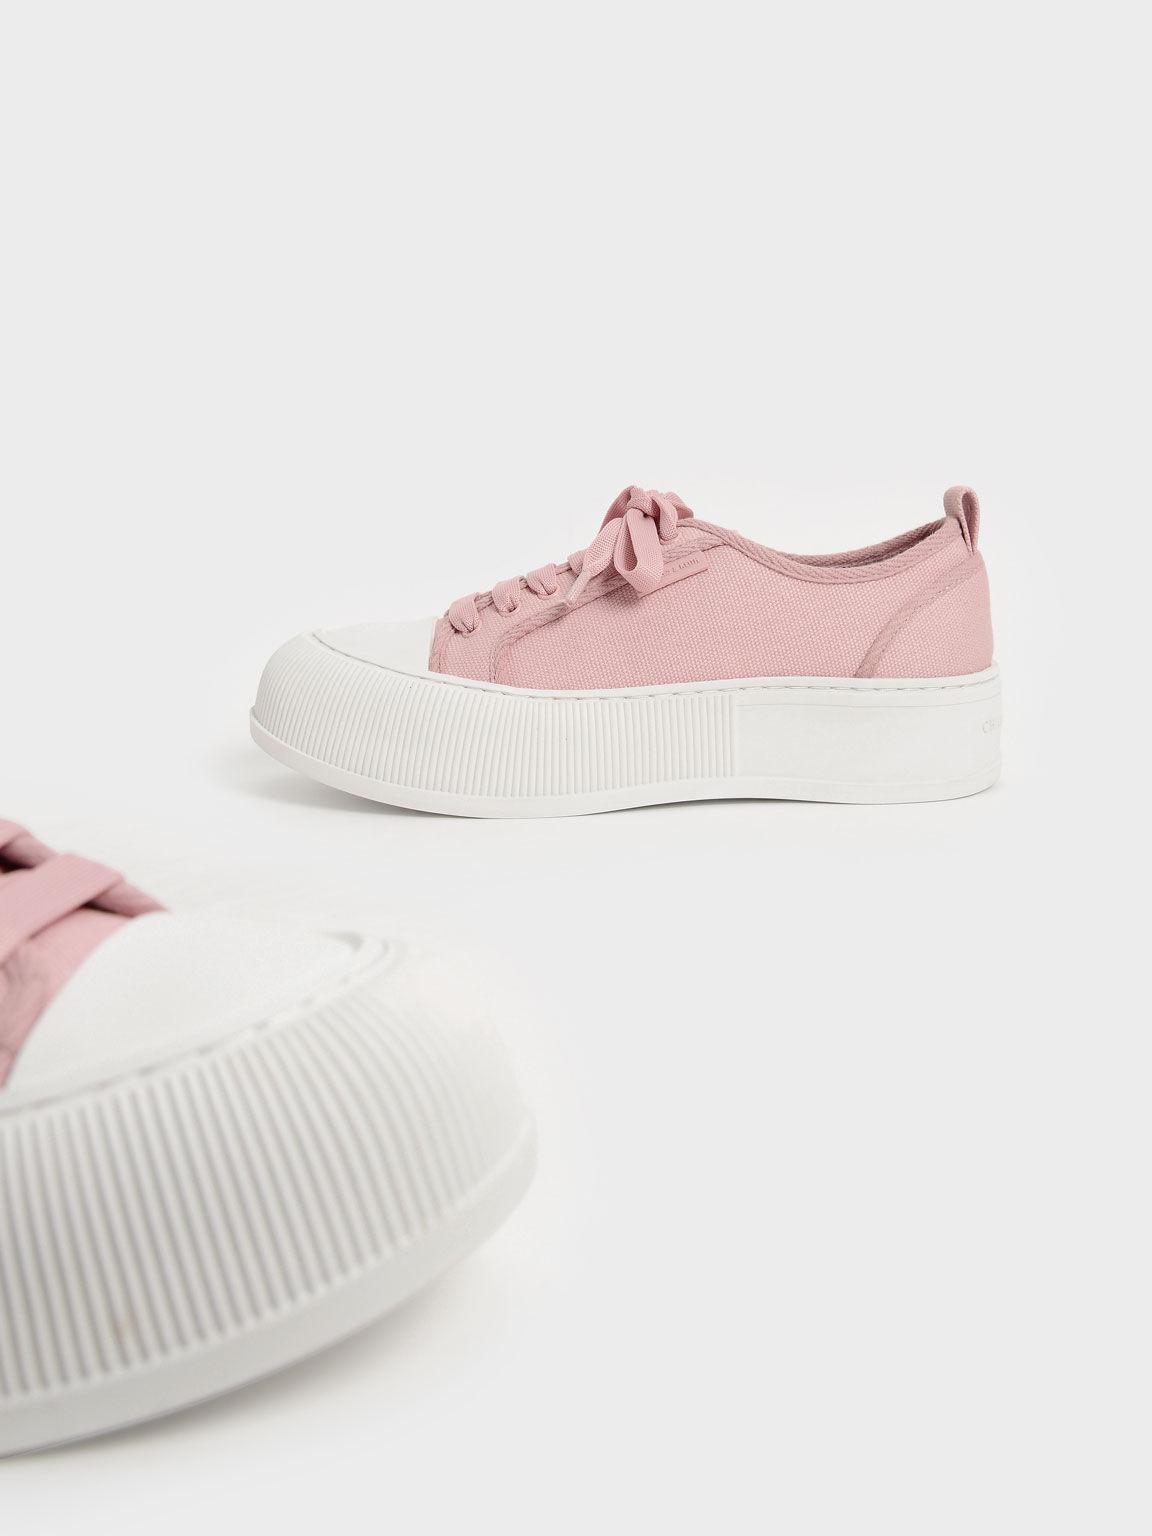 Organic Cotton Low-Top Sneakers, Pink, hi-res